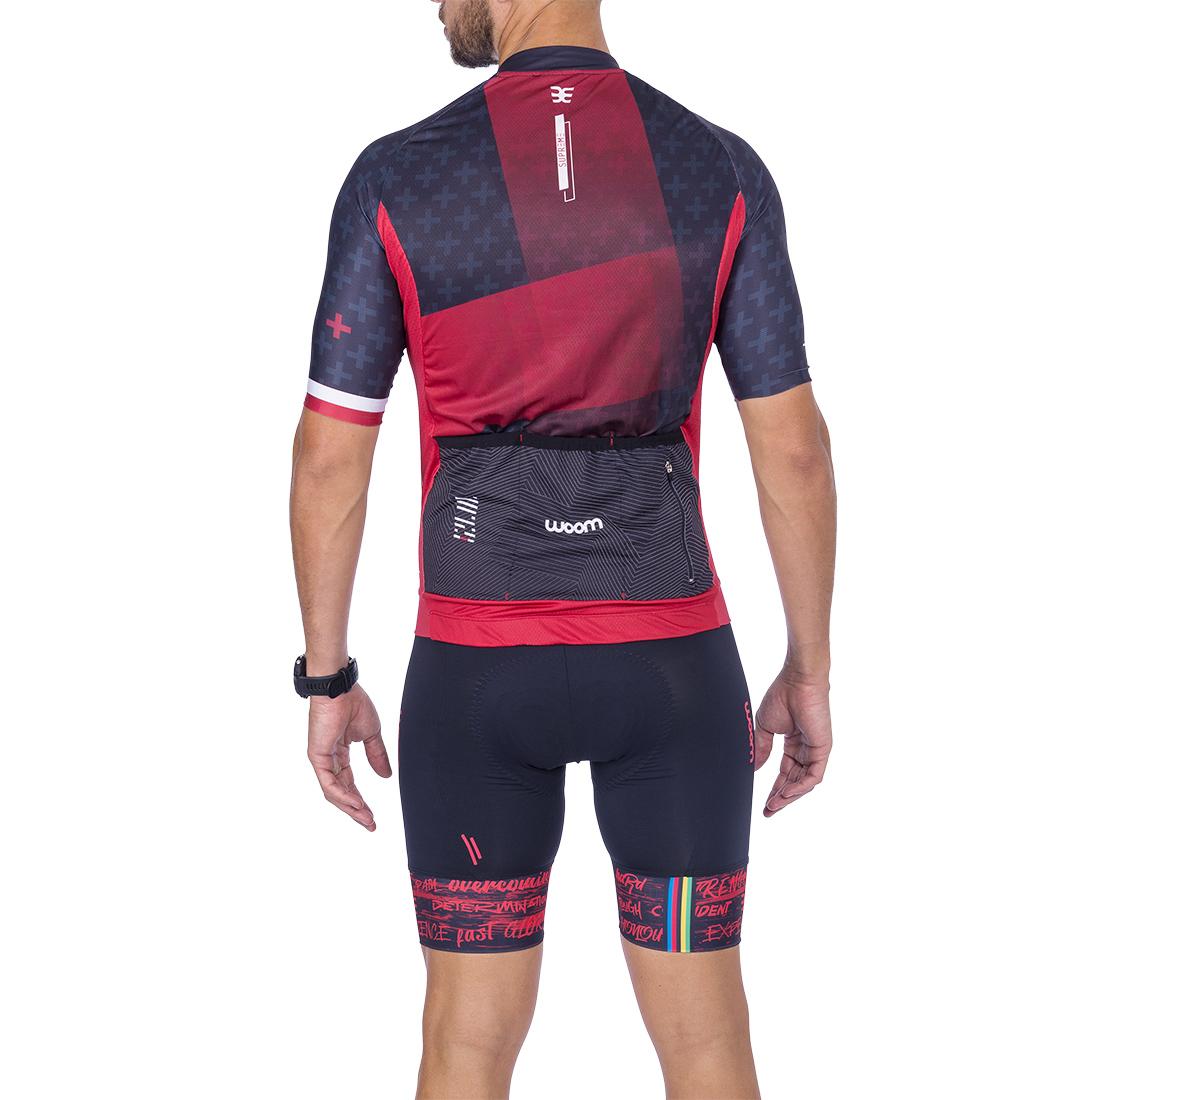 Camisa Ciclismo Supreme Zurique Masc - 2021